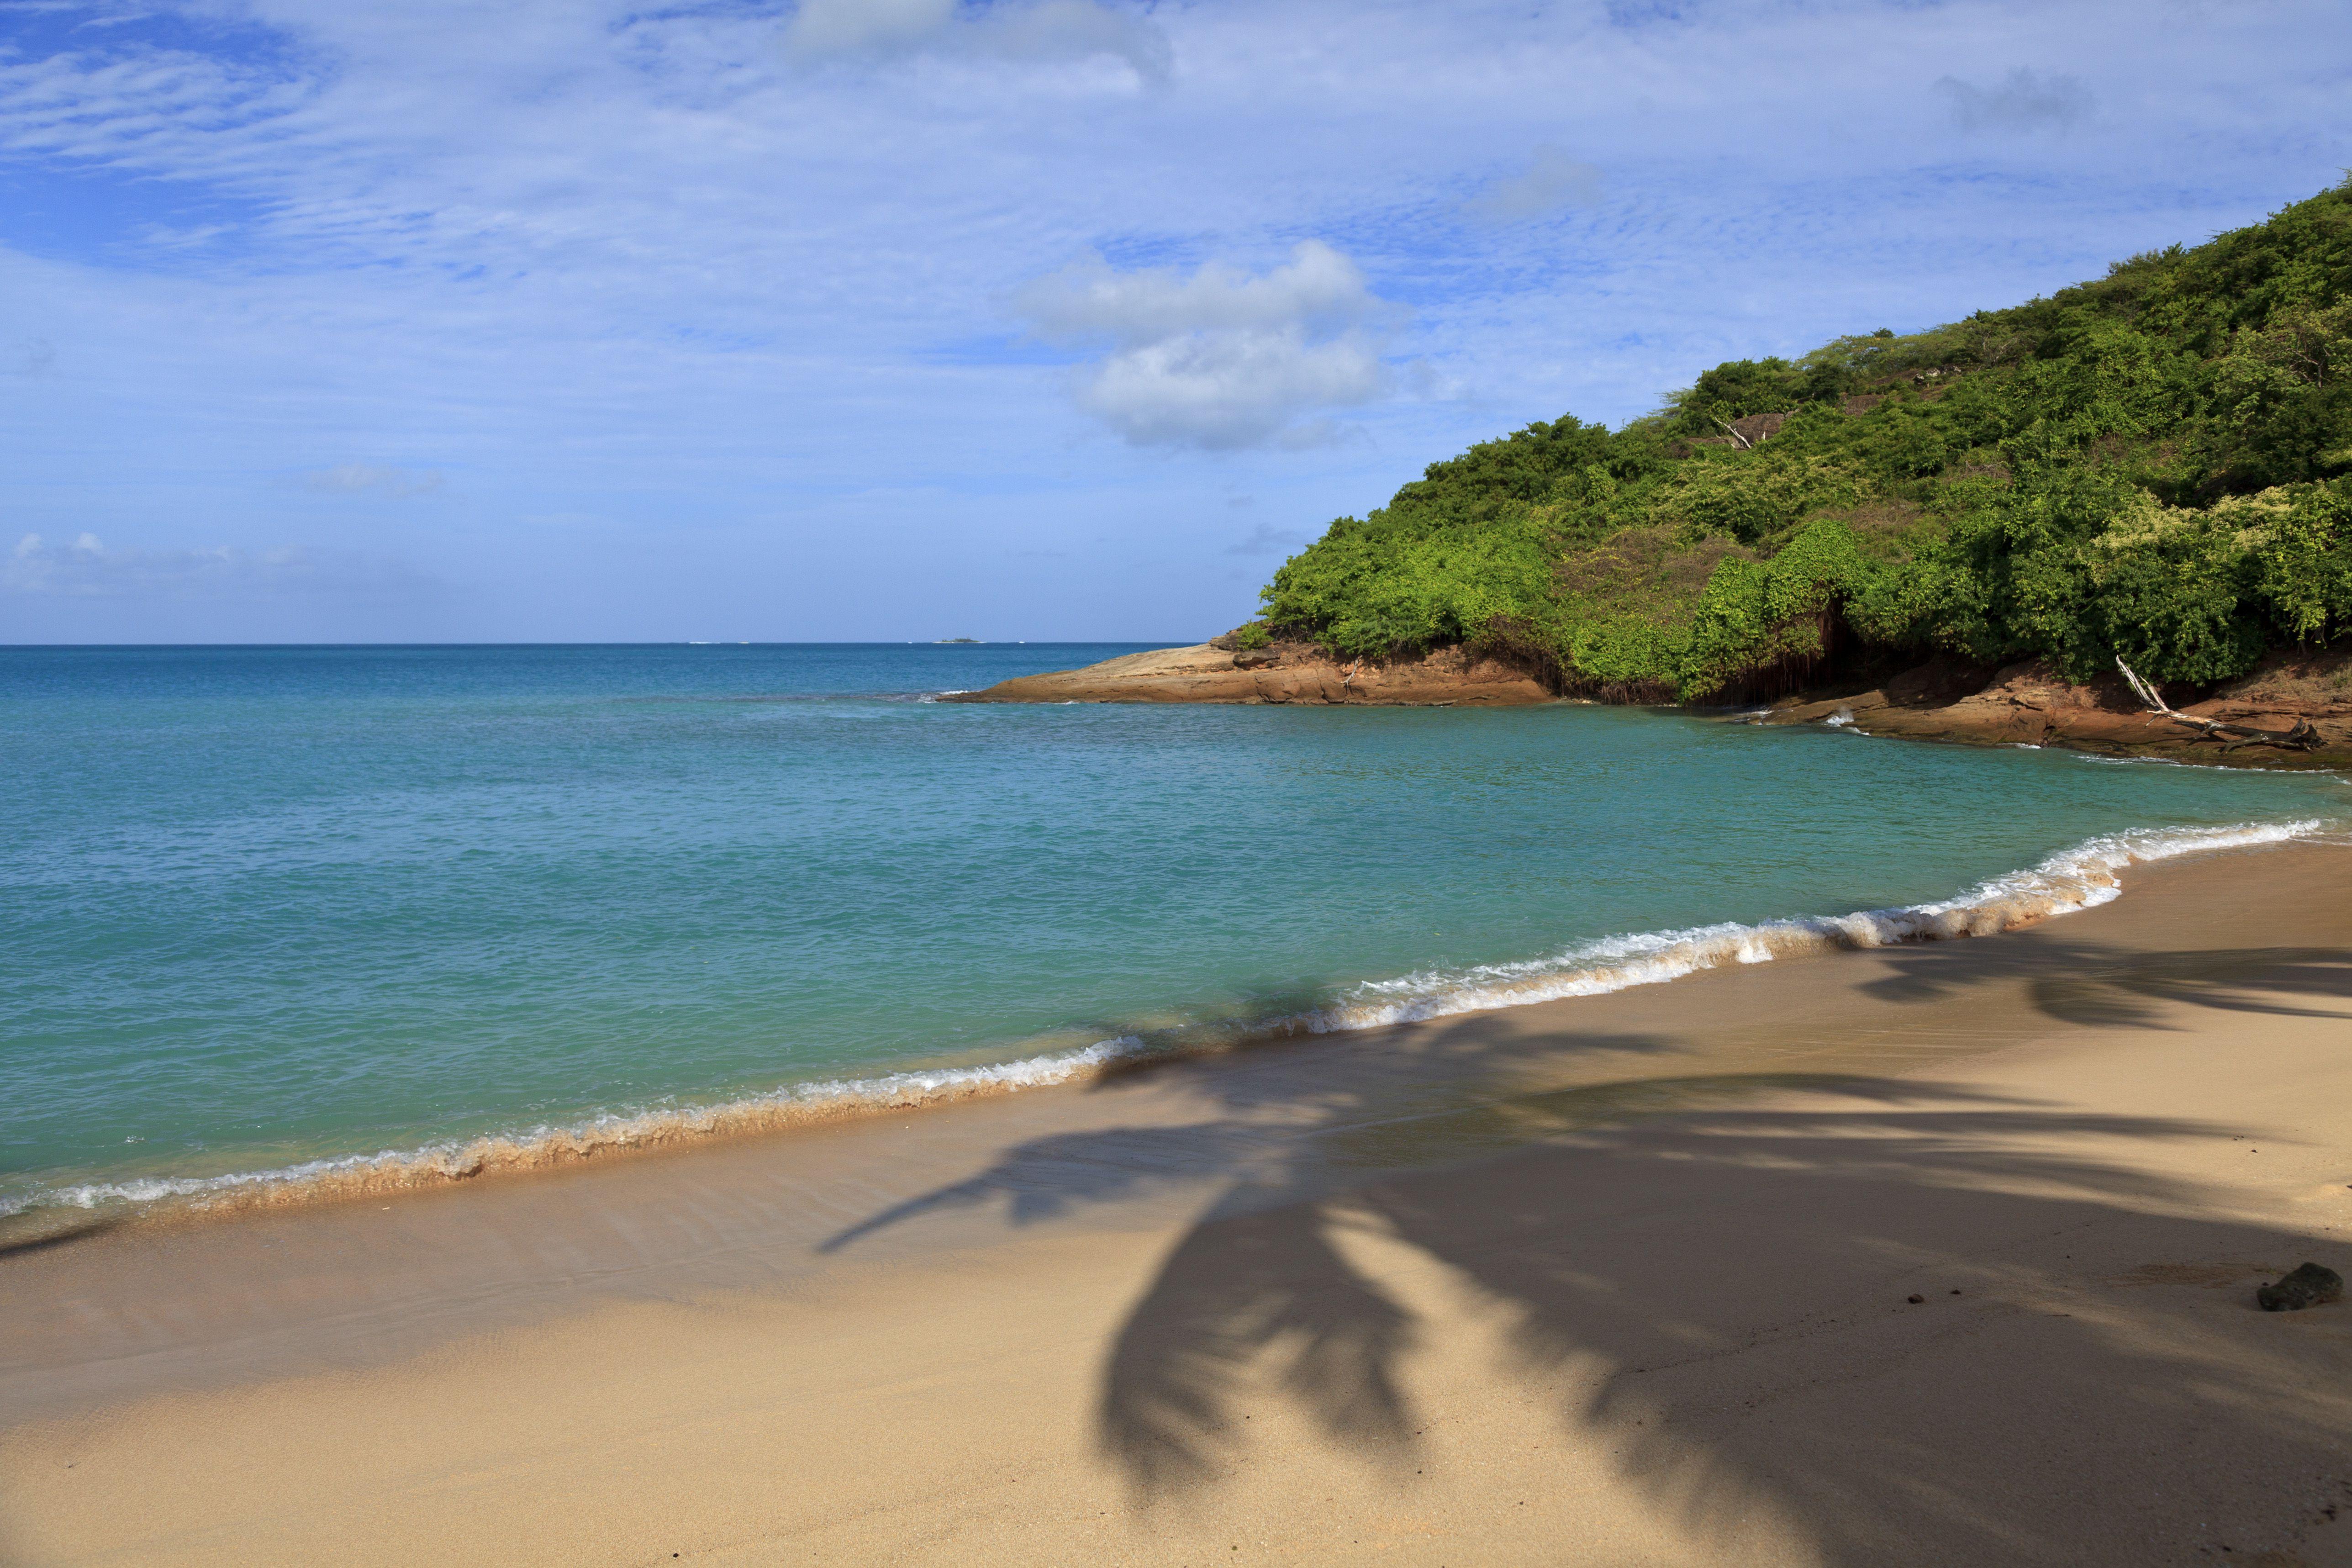 naked women on beaches